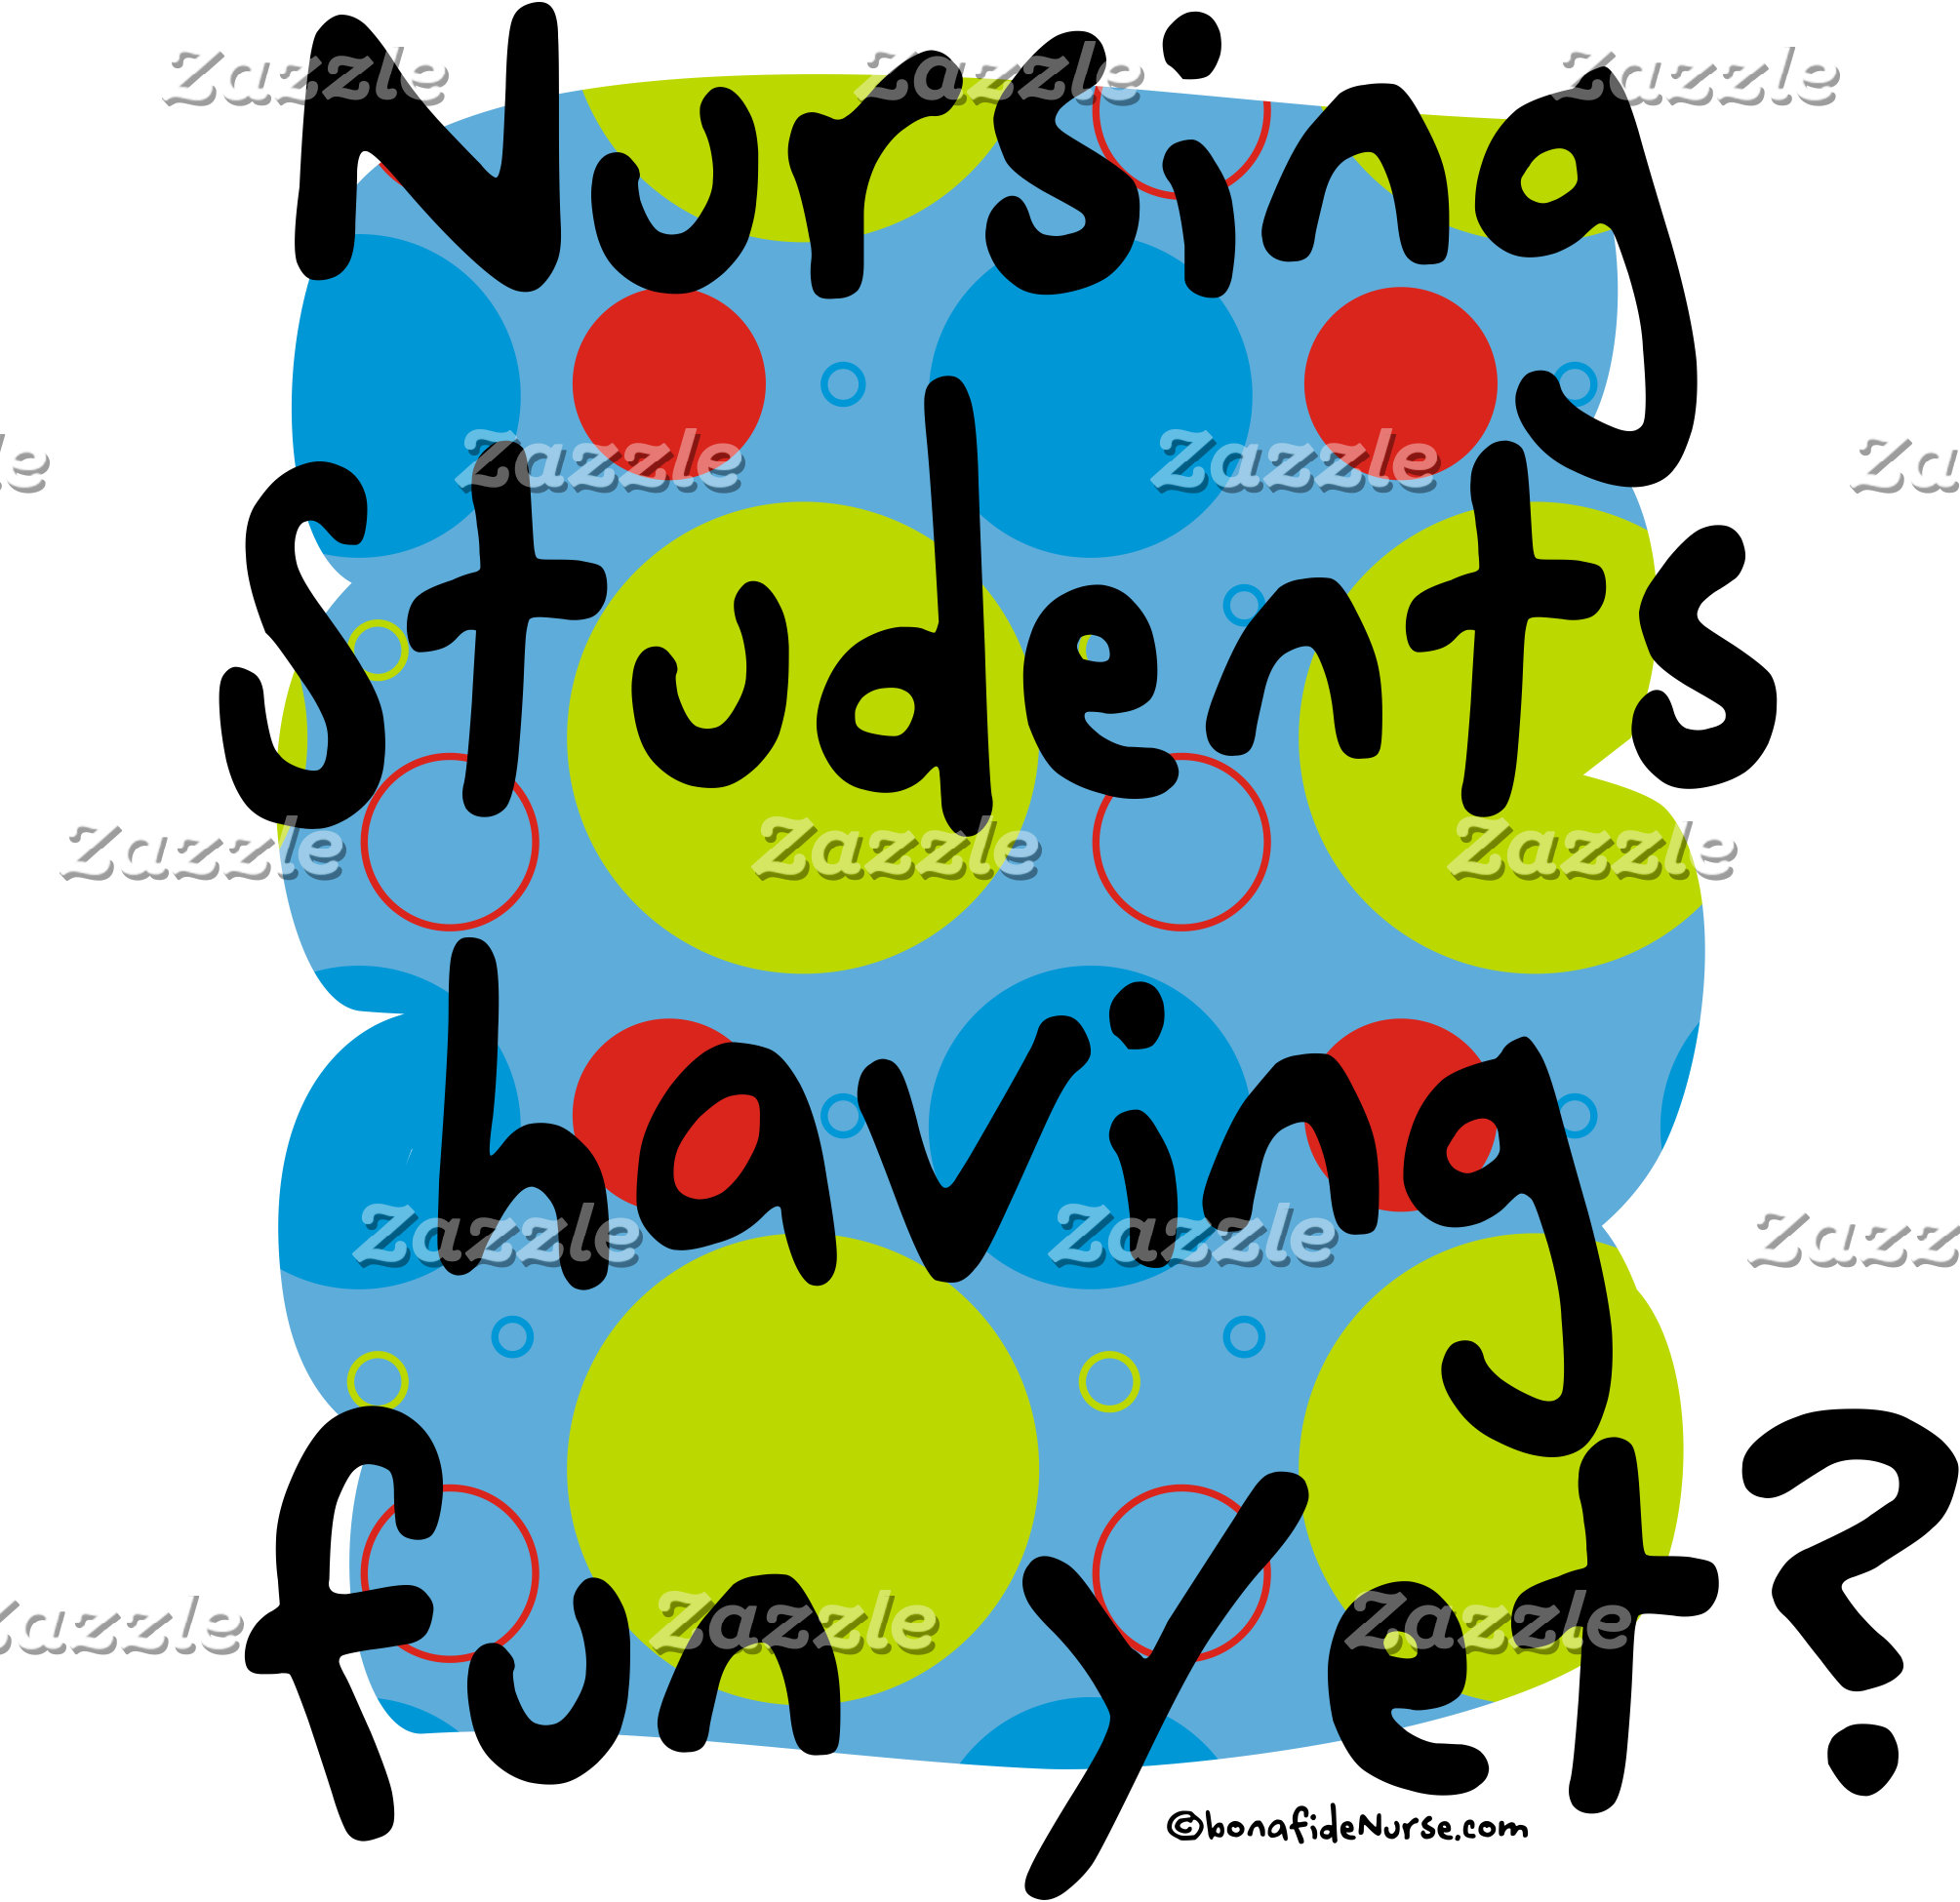 Nursing Student having Fun Yet?